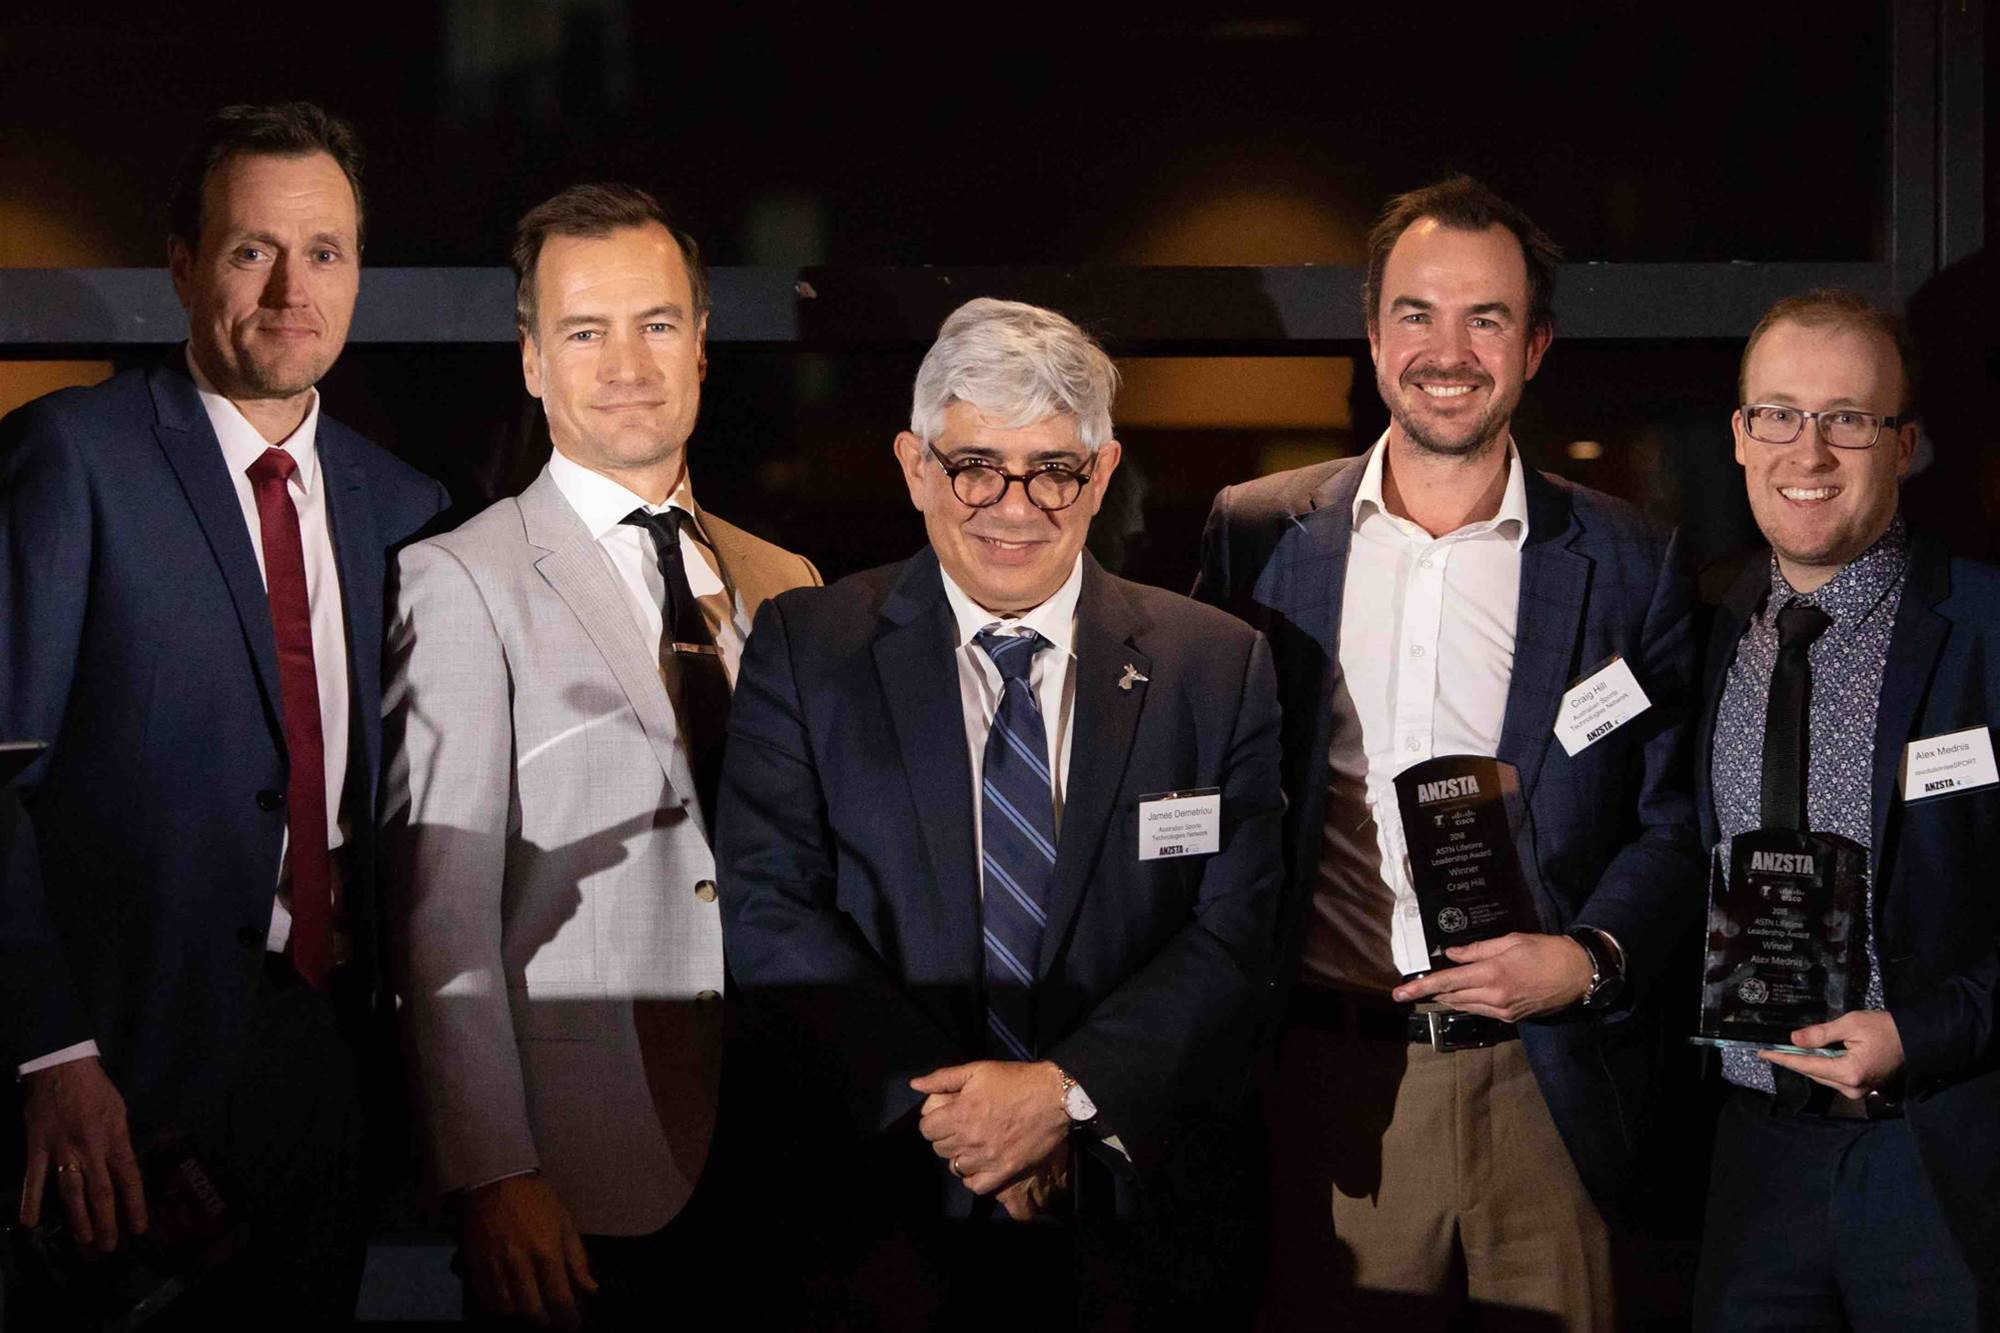 Inaugural ANZSTA award winners revealed